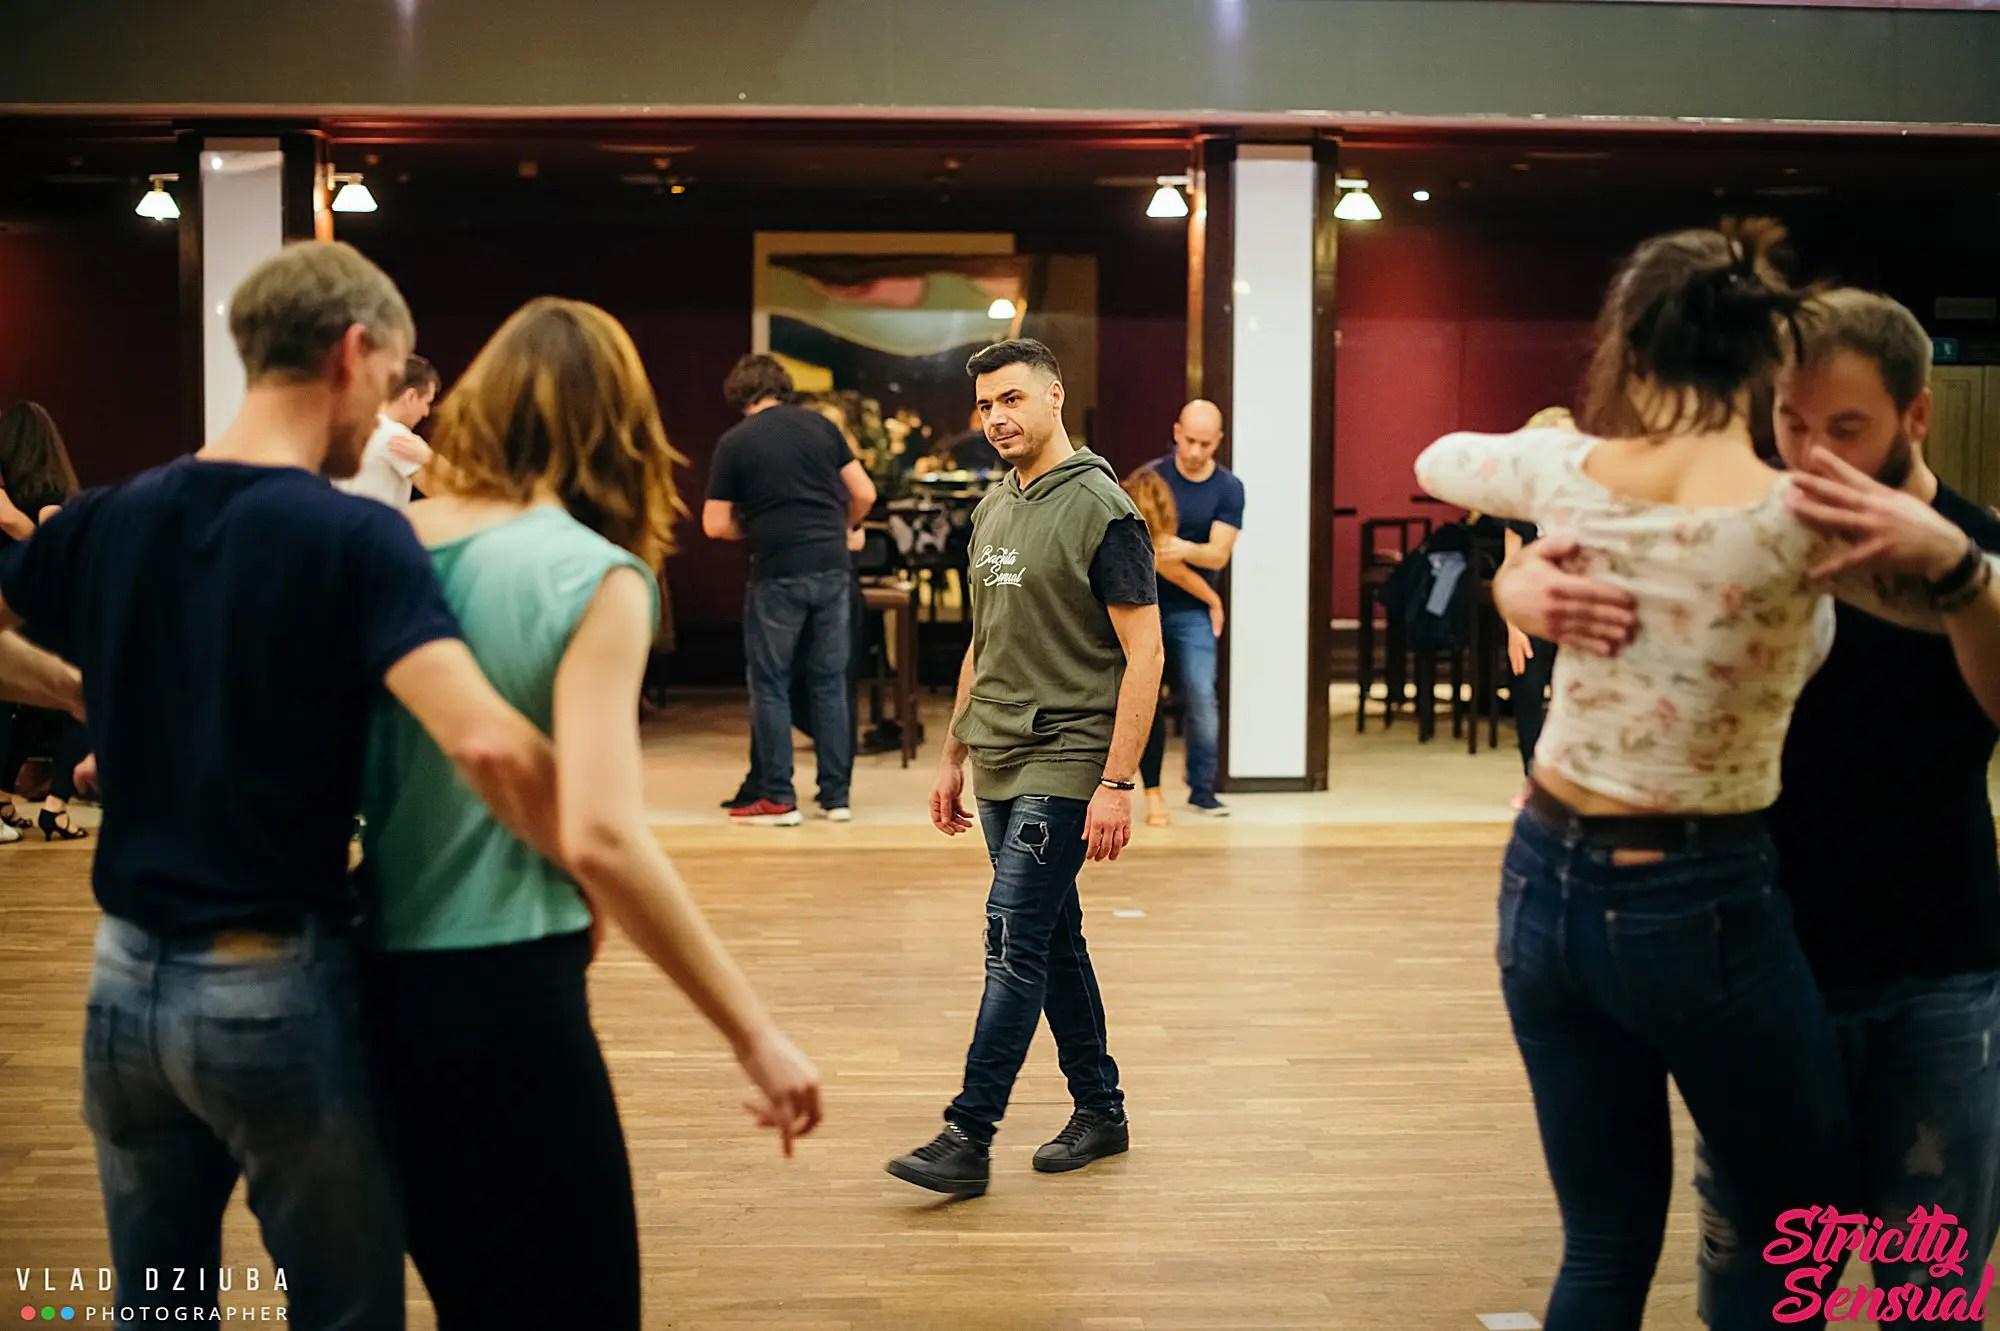 Alex Alberola teaching - Let's Dance Bachata